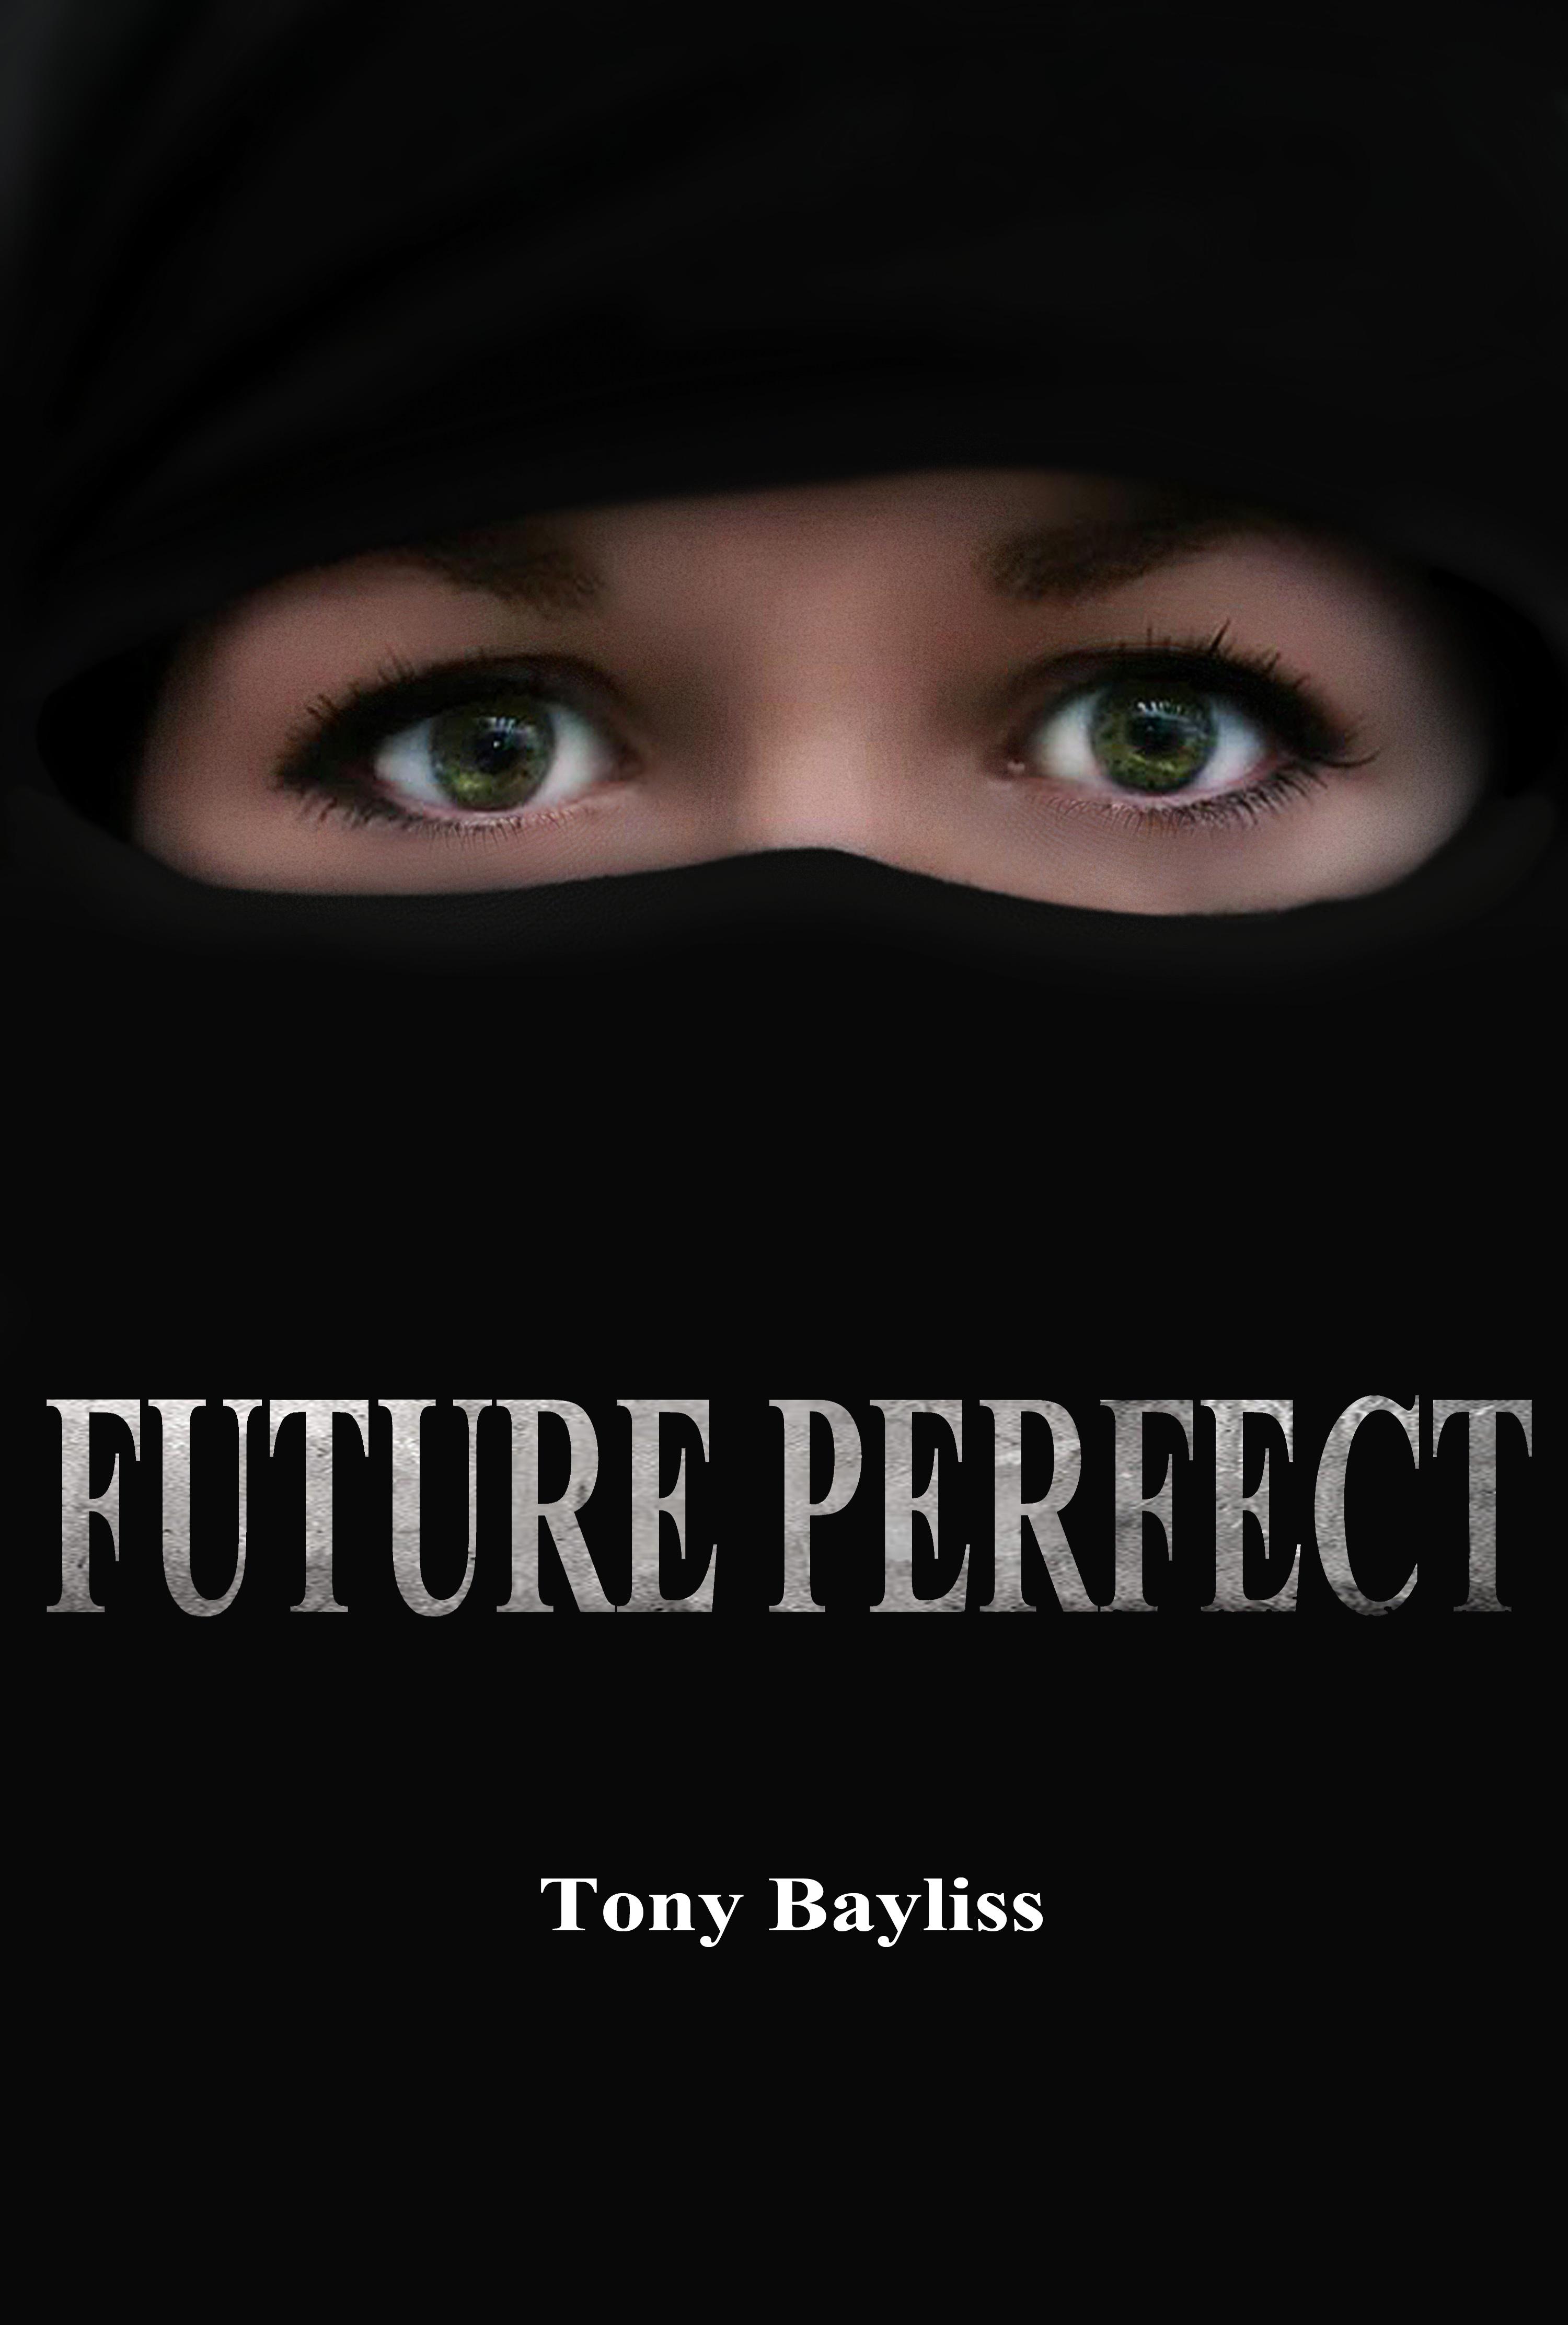 Future perfect  by Tony Bayliss